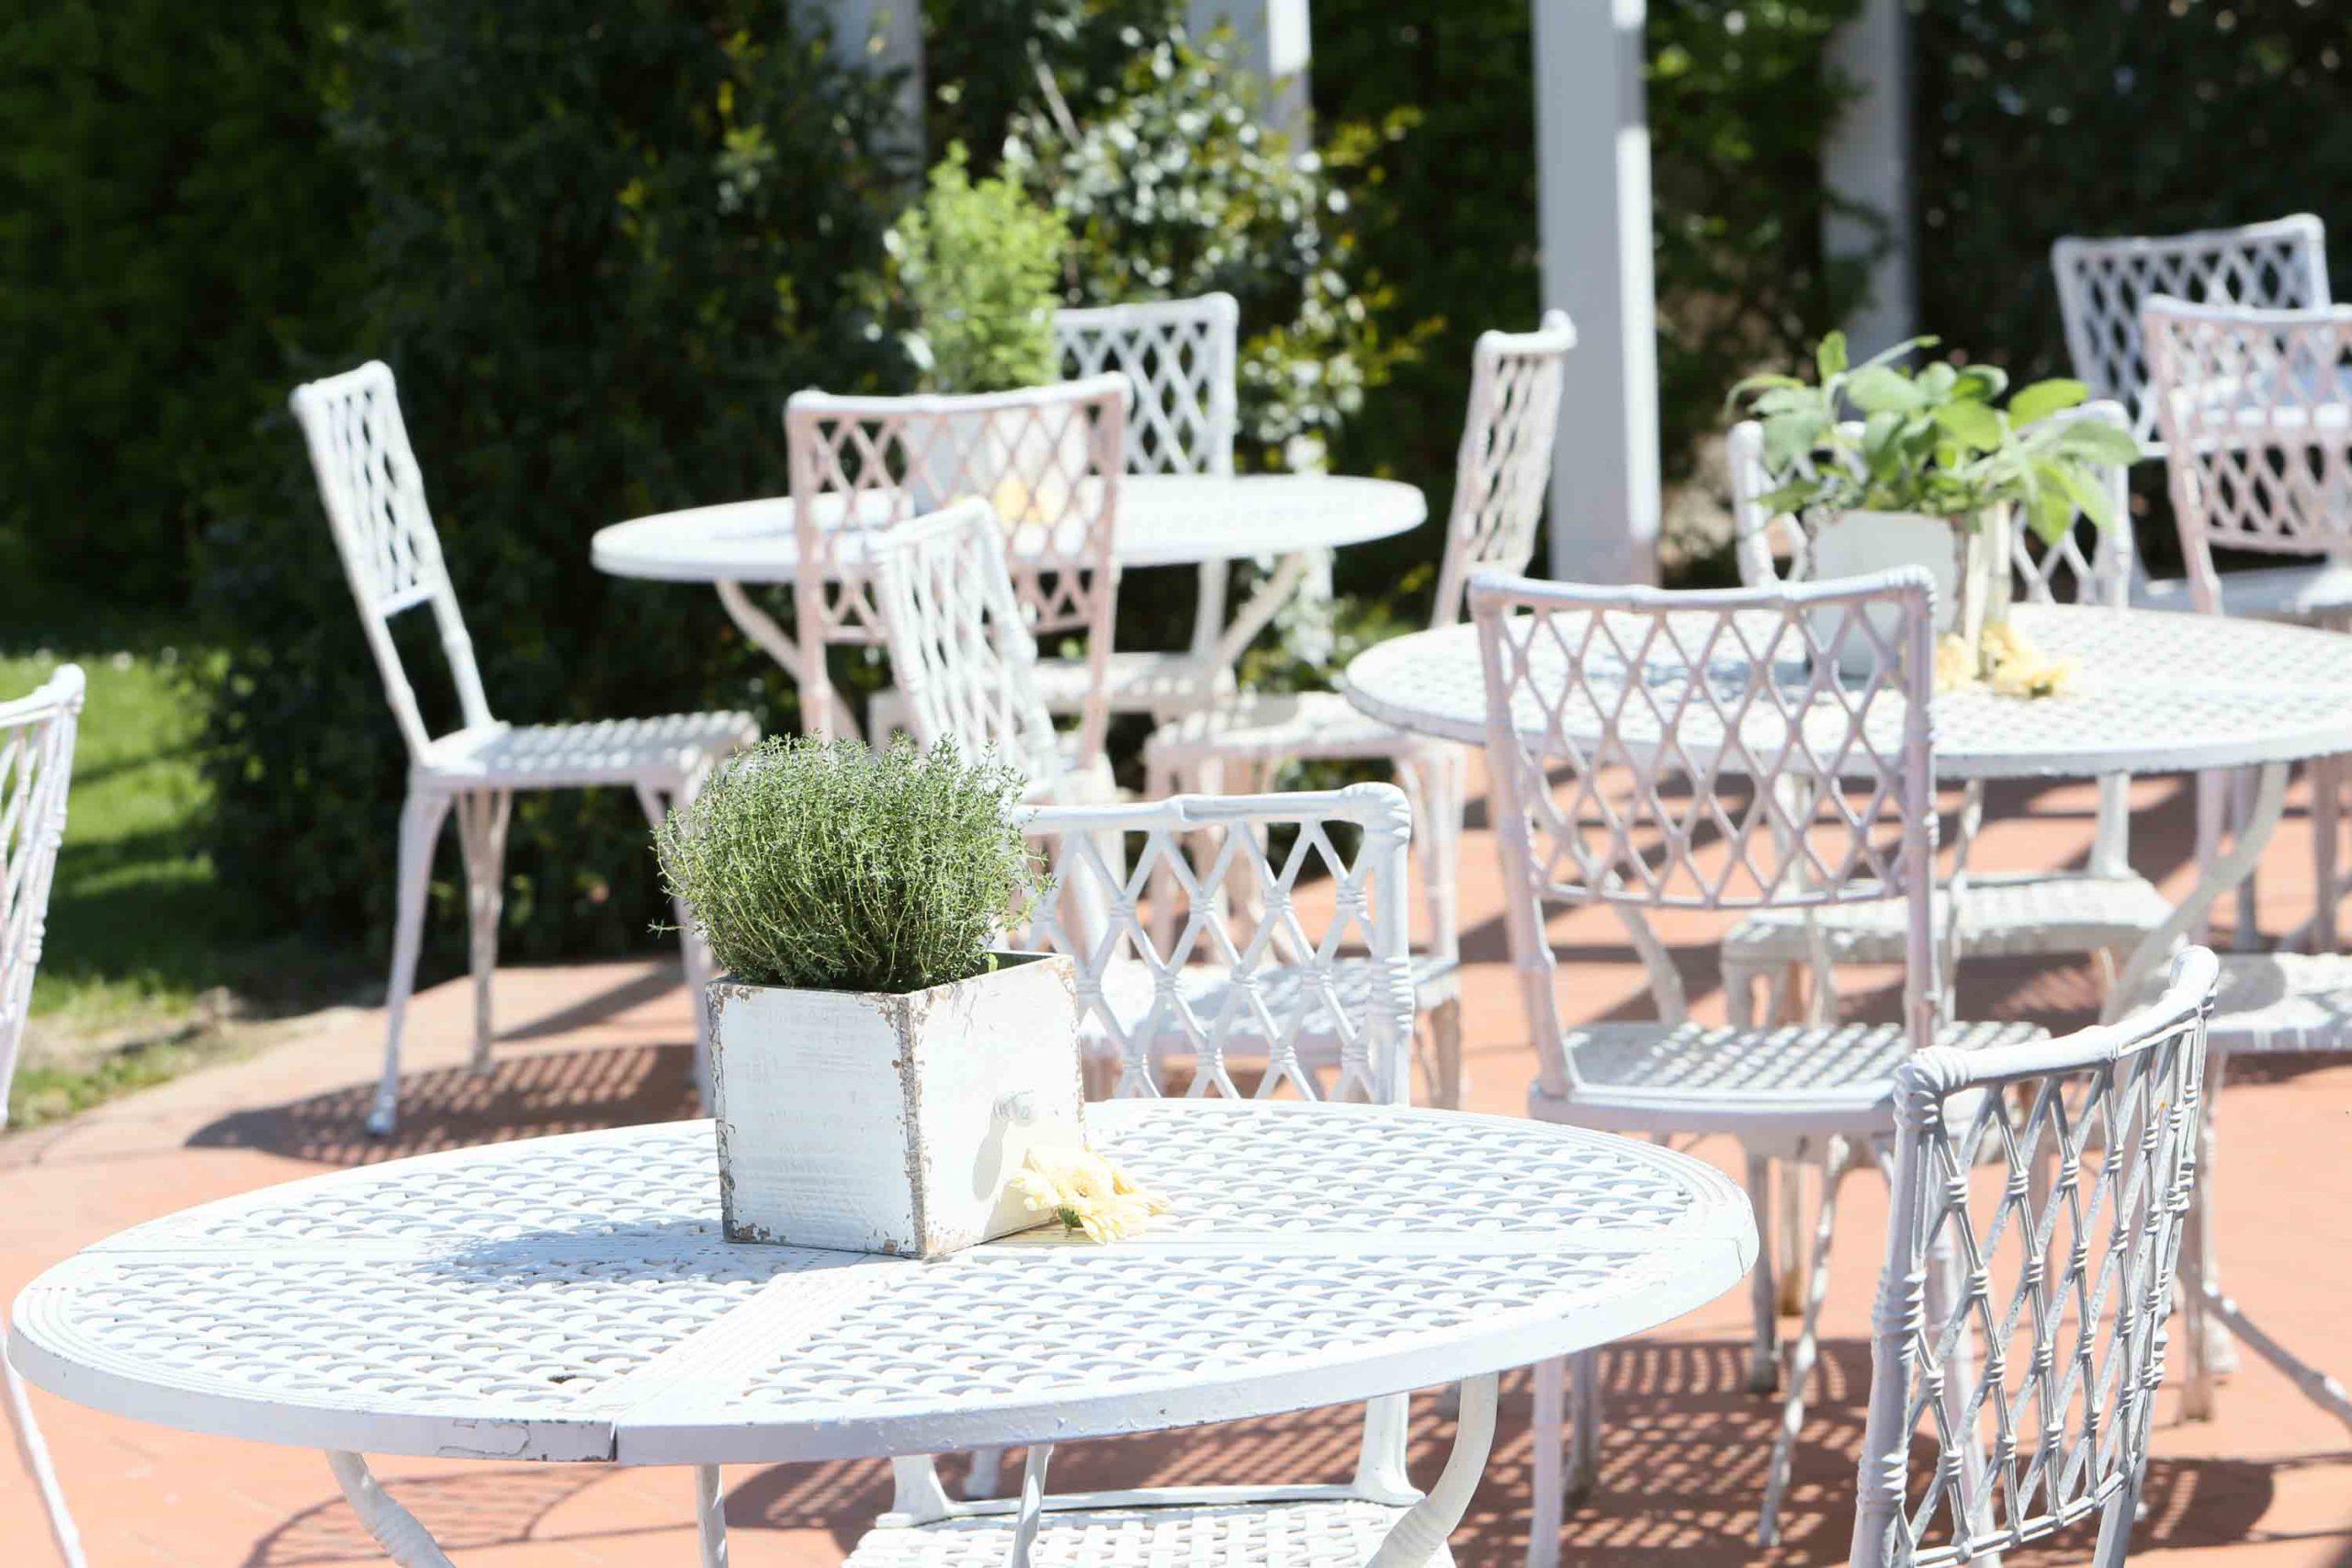 esterno-gazebo-allestimento-wedding-ristorante